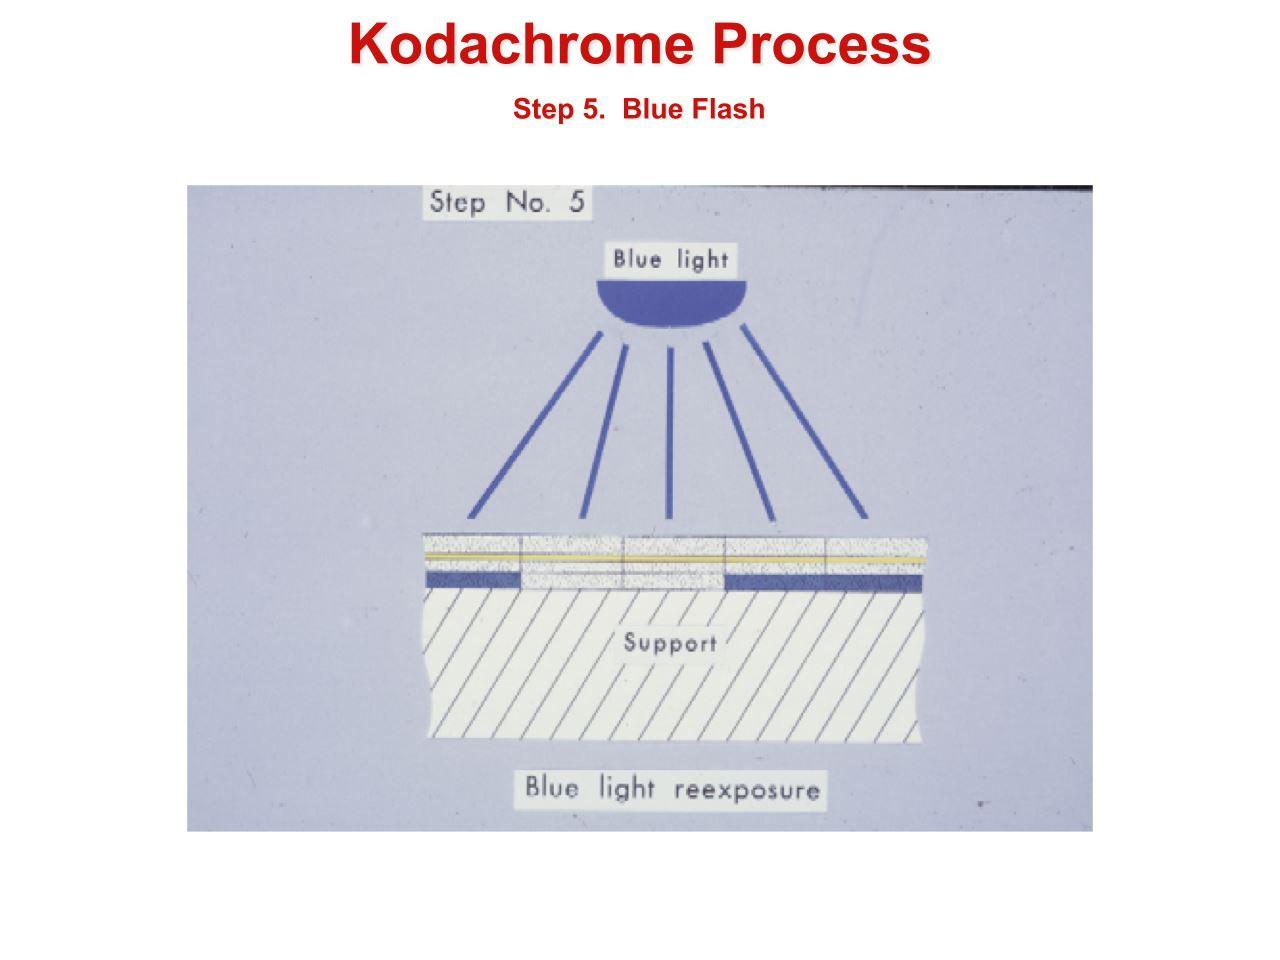 How to Develop Kodachrome Film (B&W Hand Processing